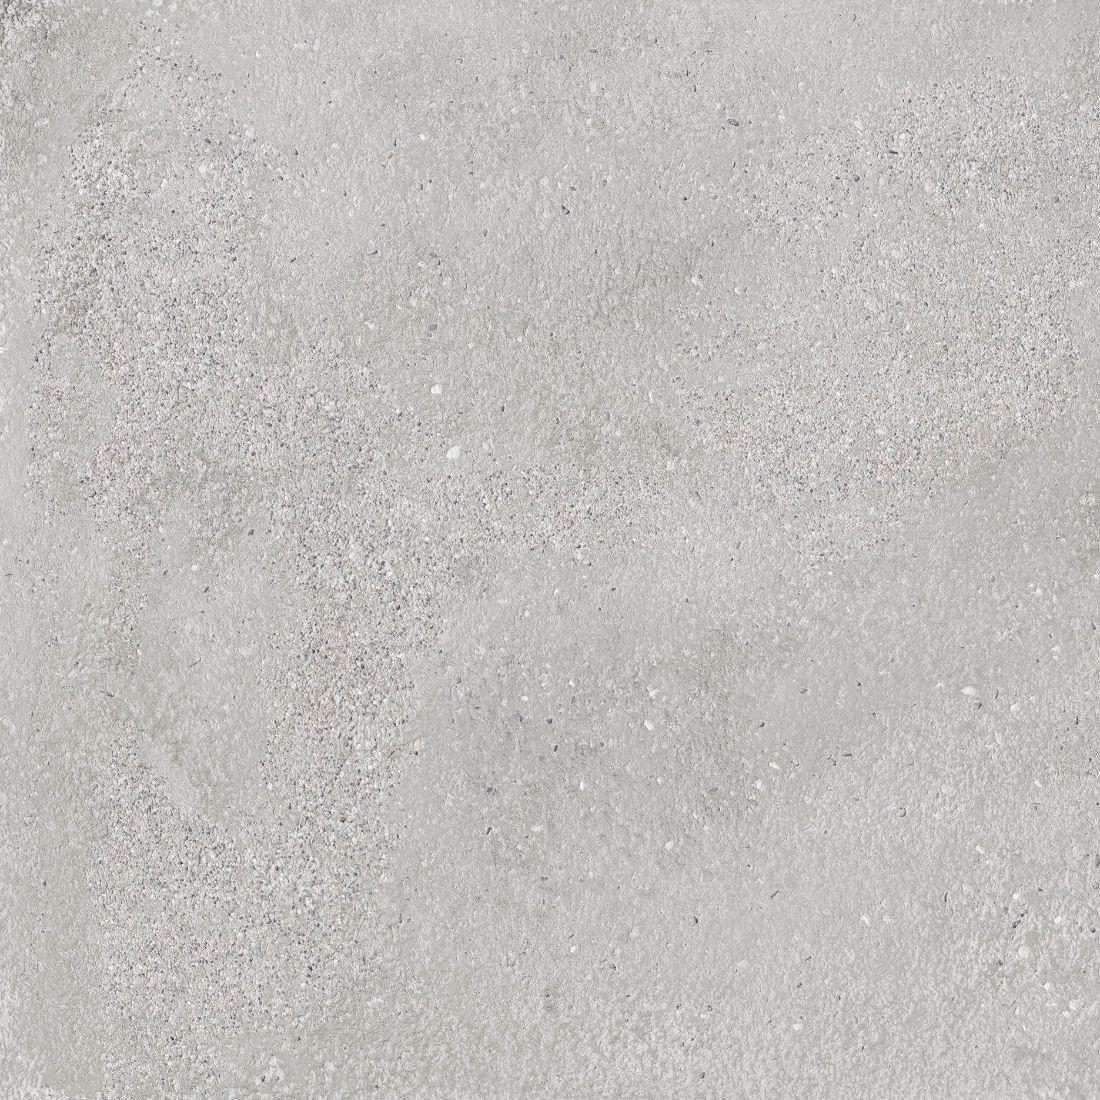 Oslo Porcelain Tile Cenere 600 x 600 x 20mm